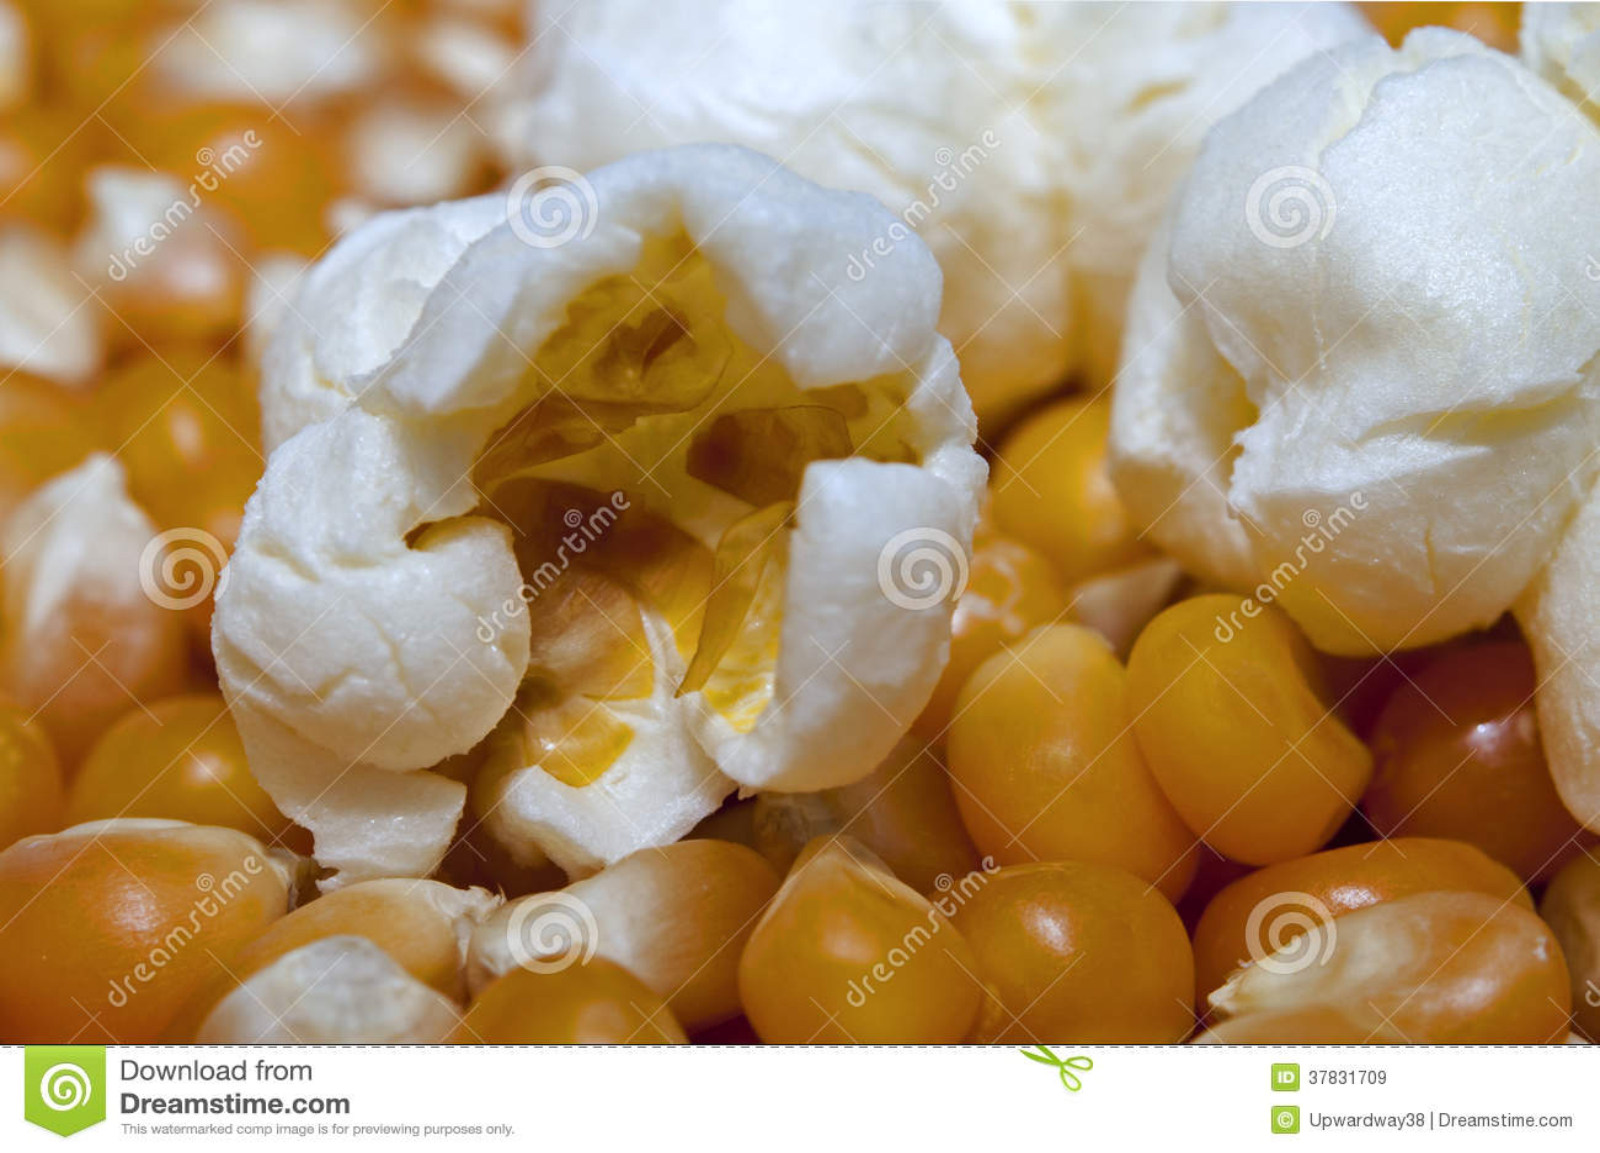 Unpopped Popcorn Kernel Clipart Popcorn and kernels